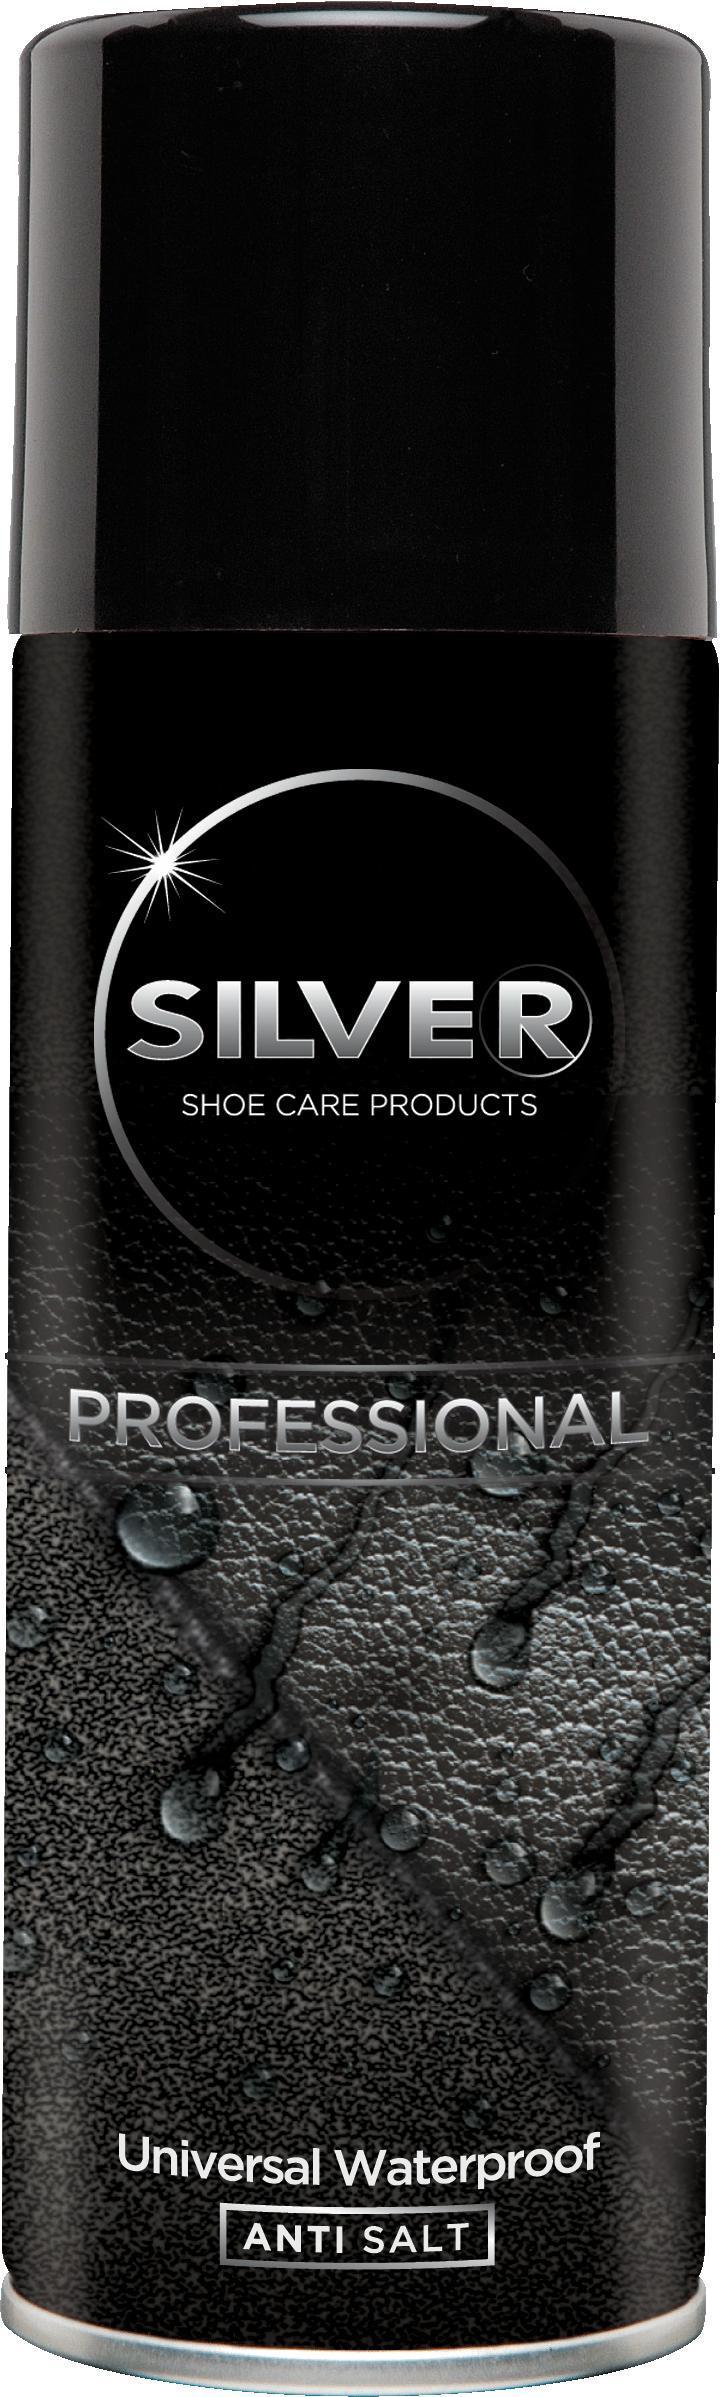 SILVER Professional Водоотталкивающий спрей 200мл